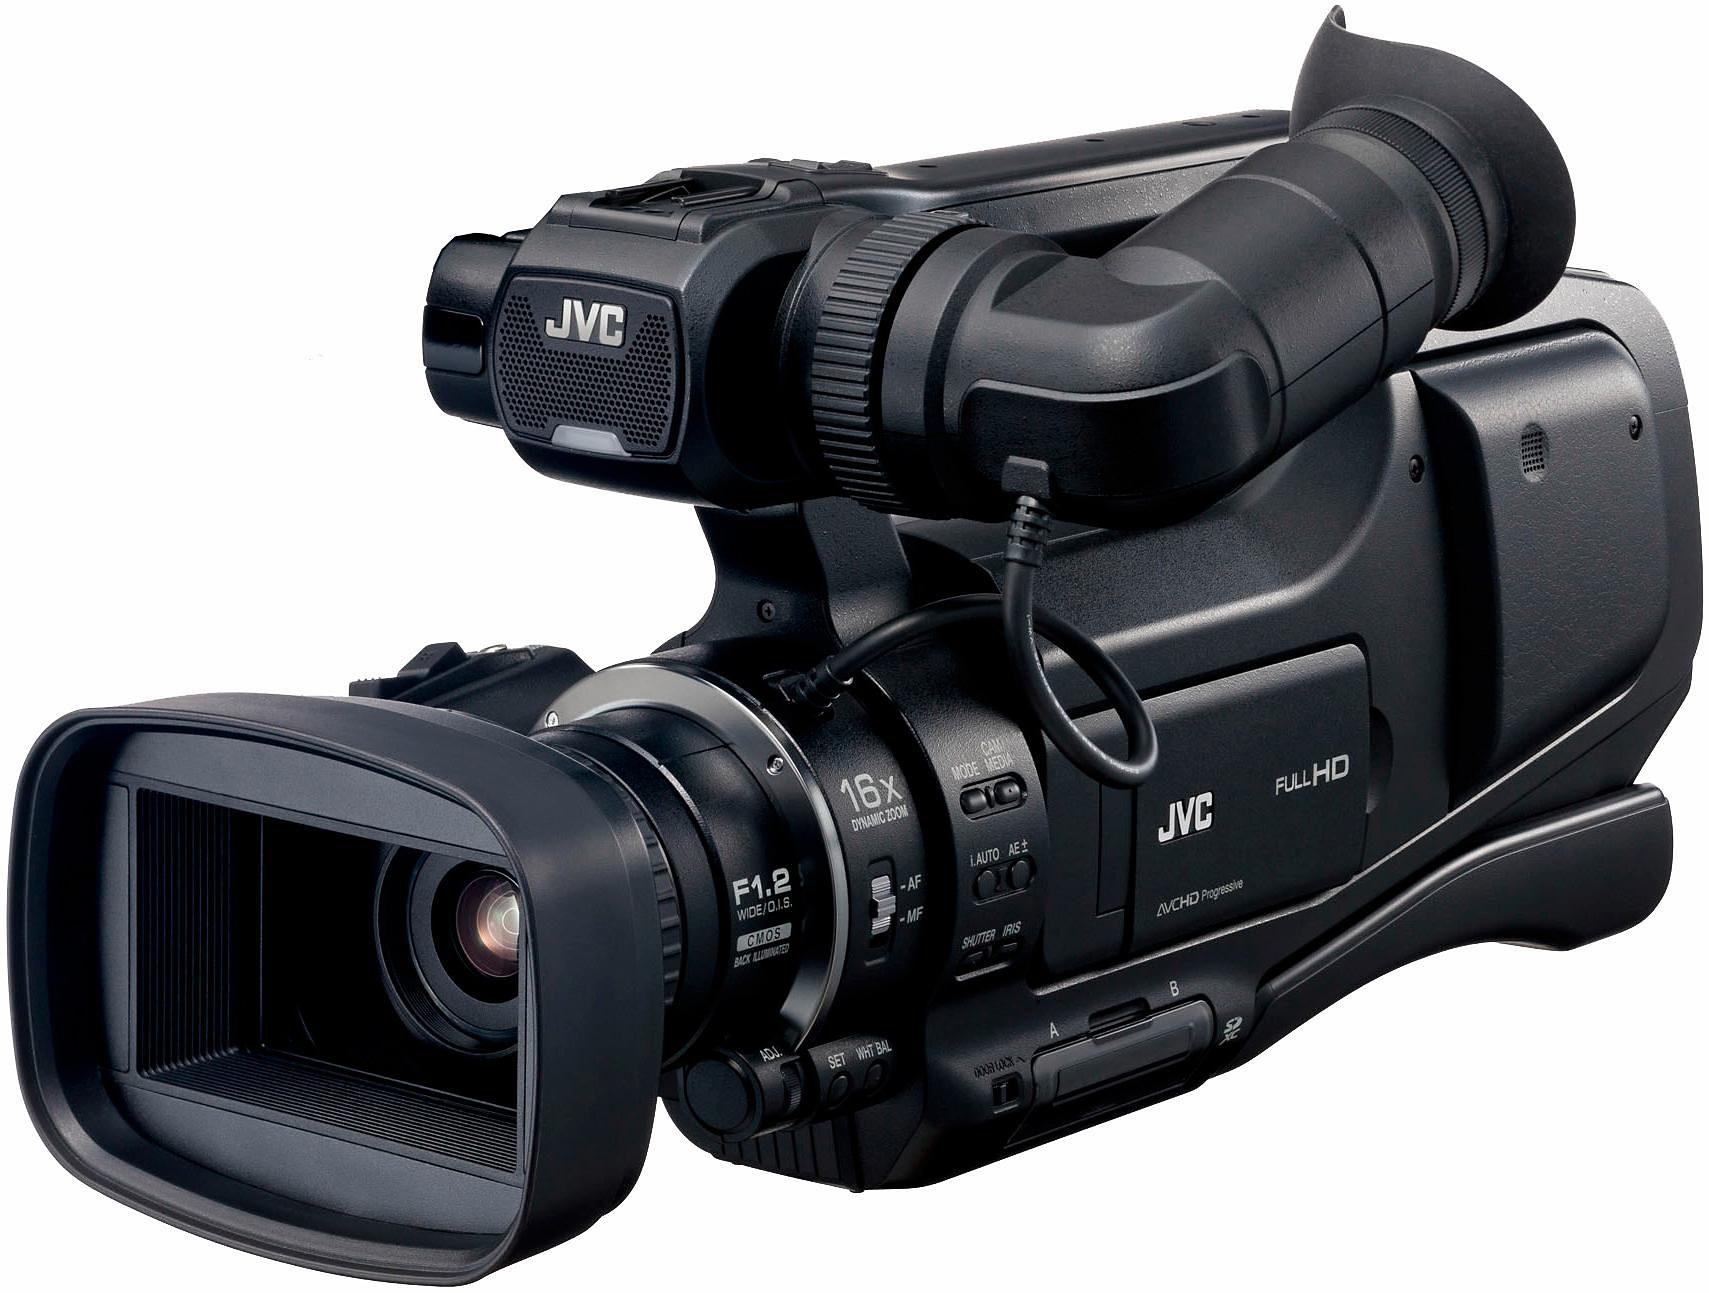 JVC GY-HM70E 1080p (Full HD) Camcorder